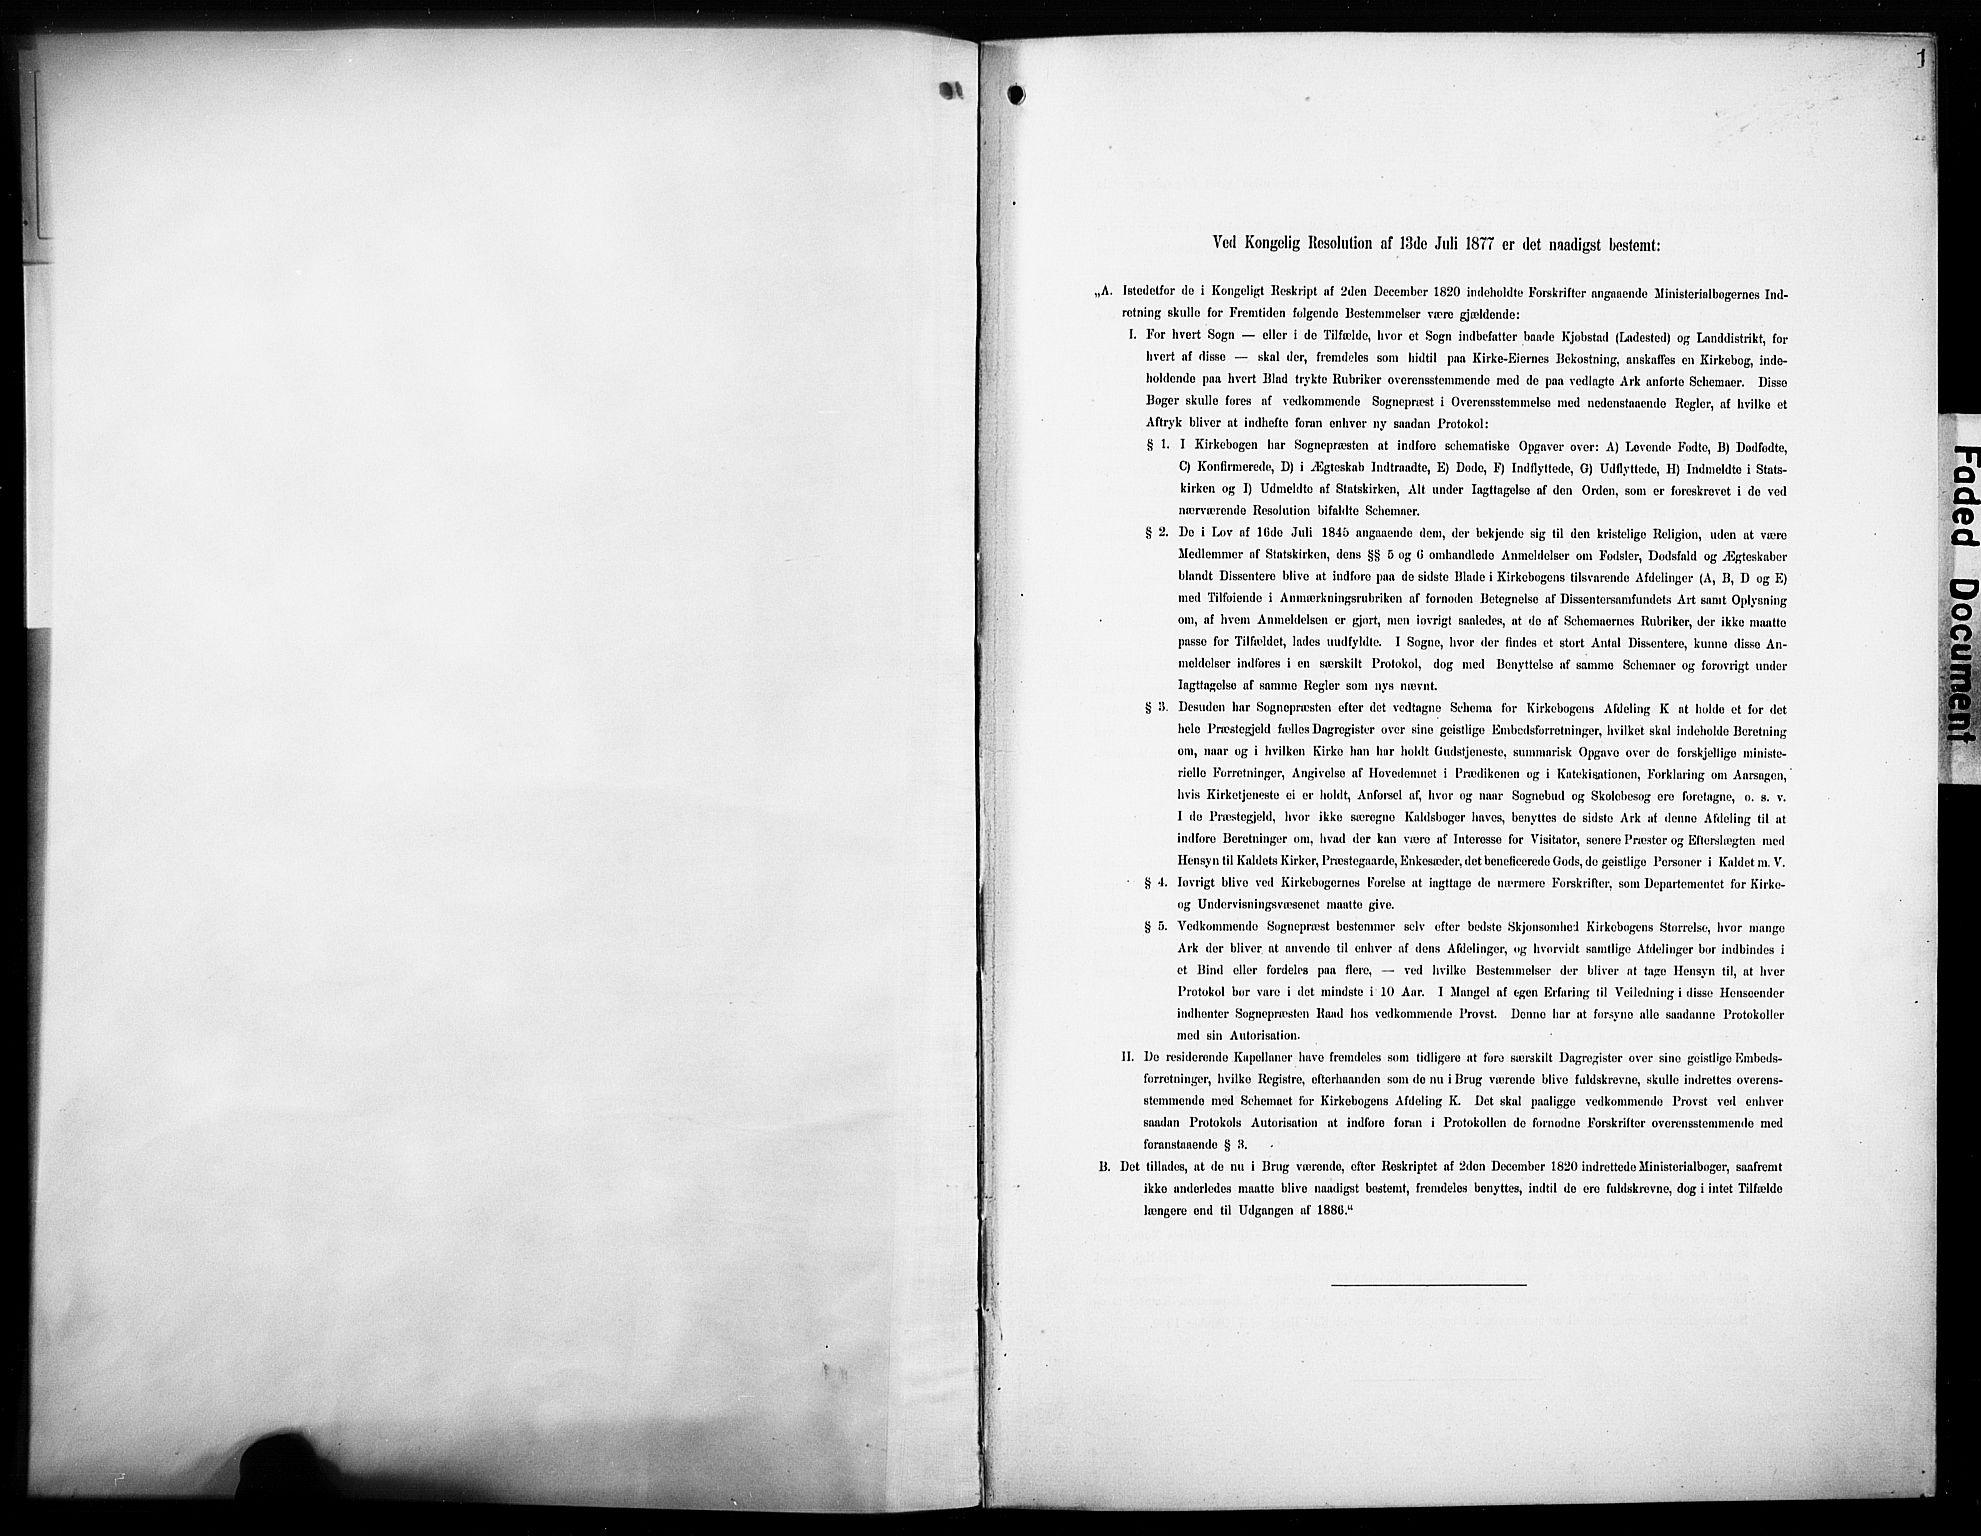 SAH, Øyer prestekontor, Ministerialbok nr. 10, 1906-1919, s. 1